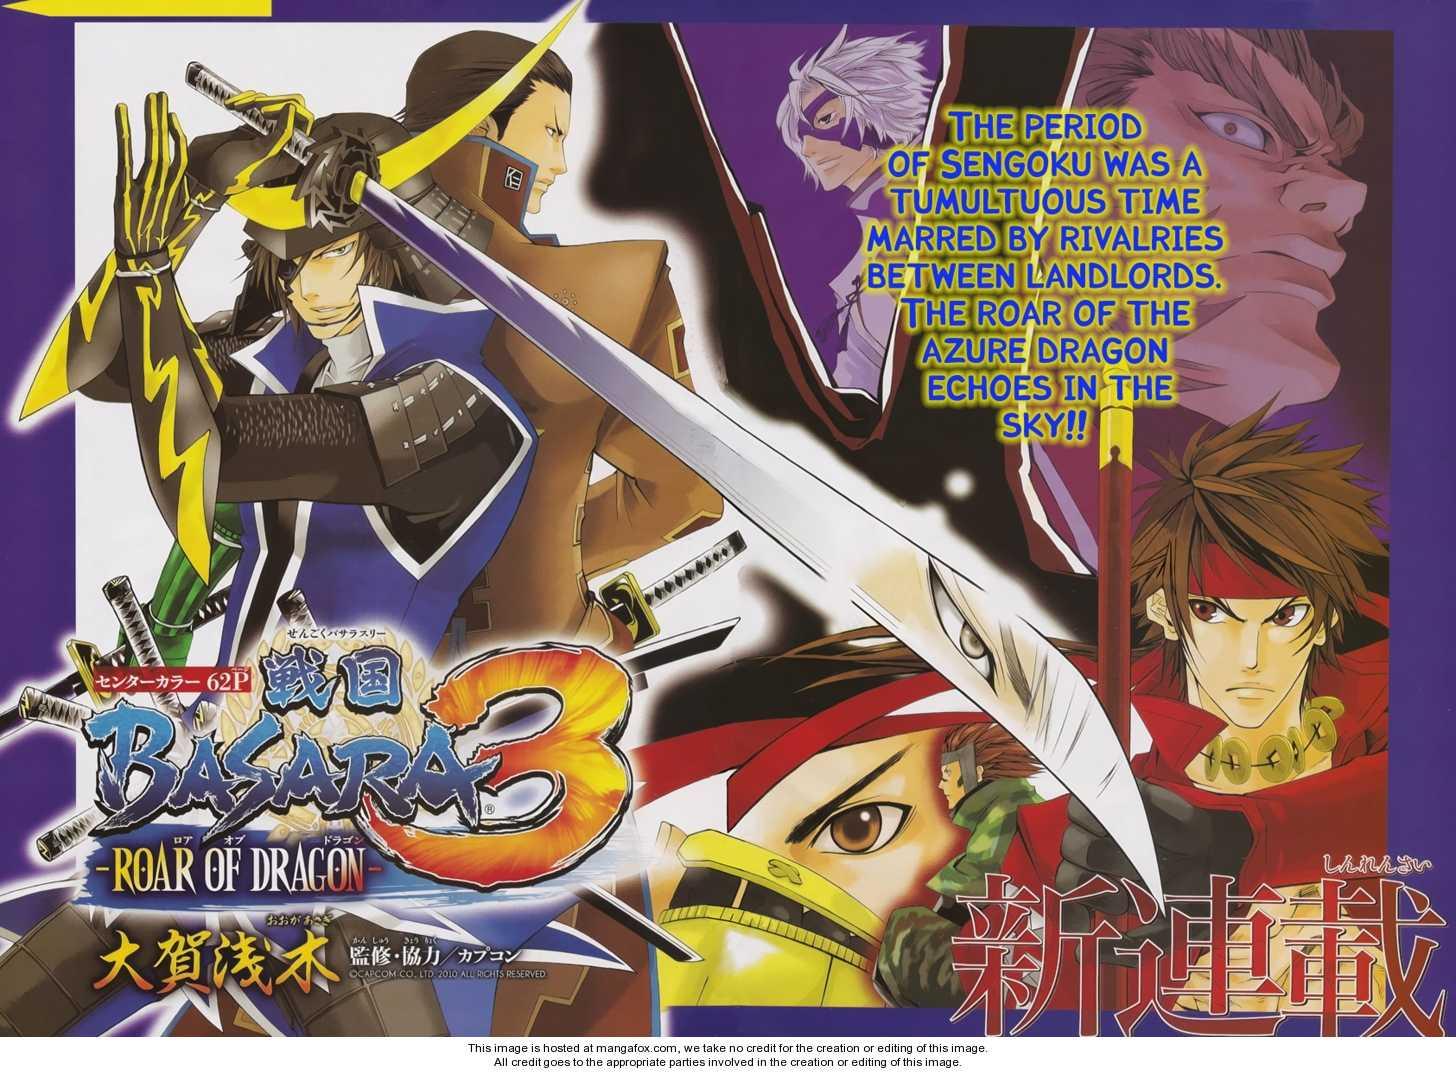 Sengoku Basara 3 - Roar of Dragon 1 Page 2